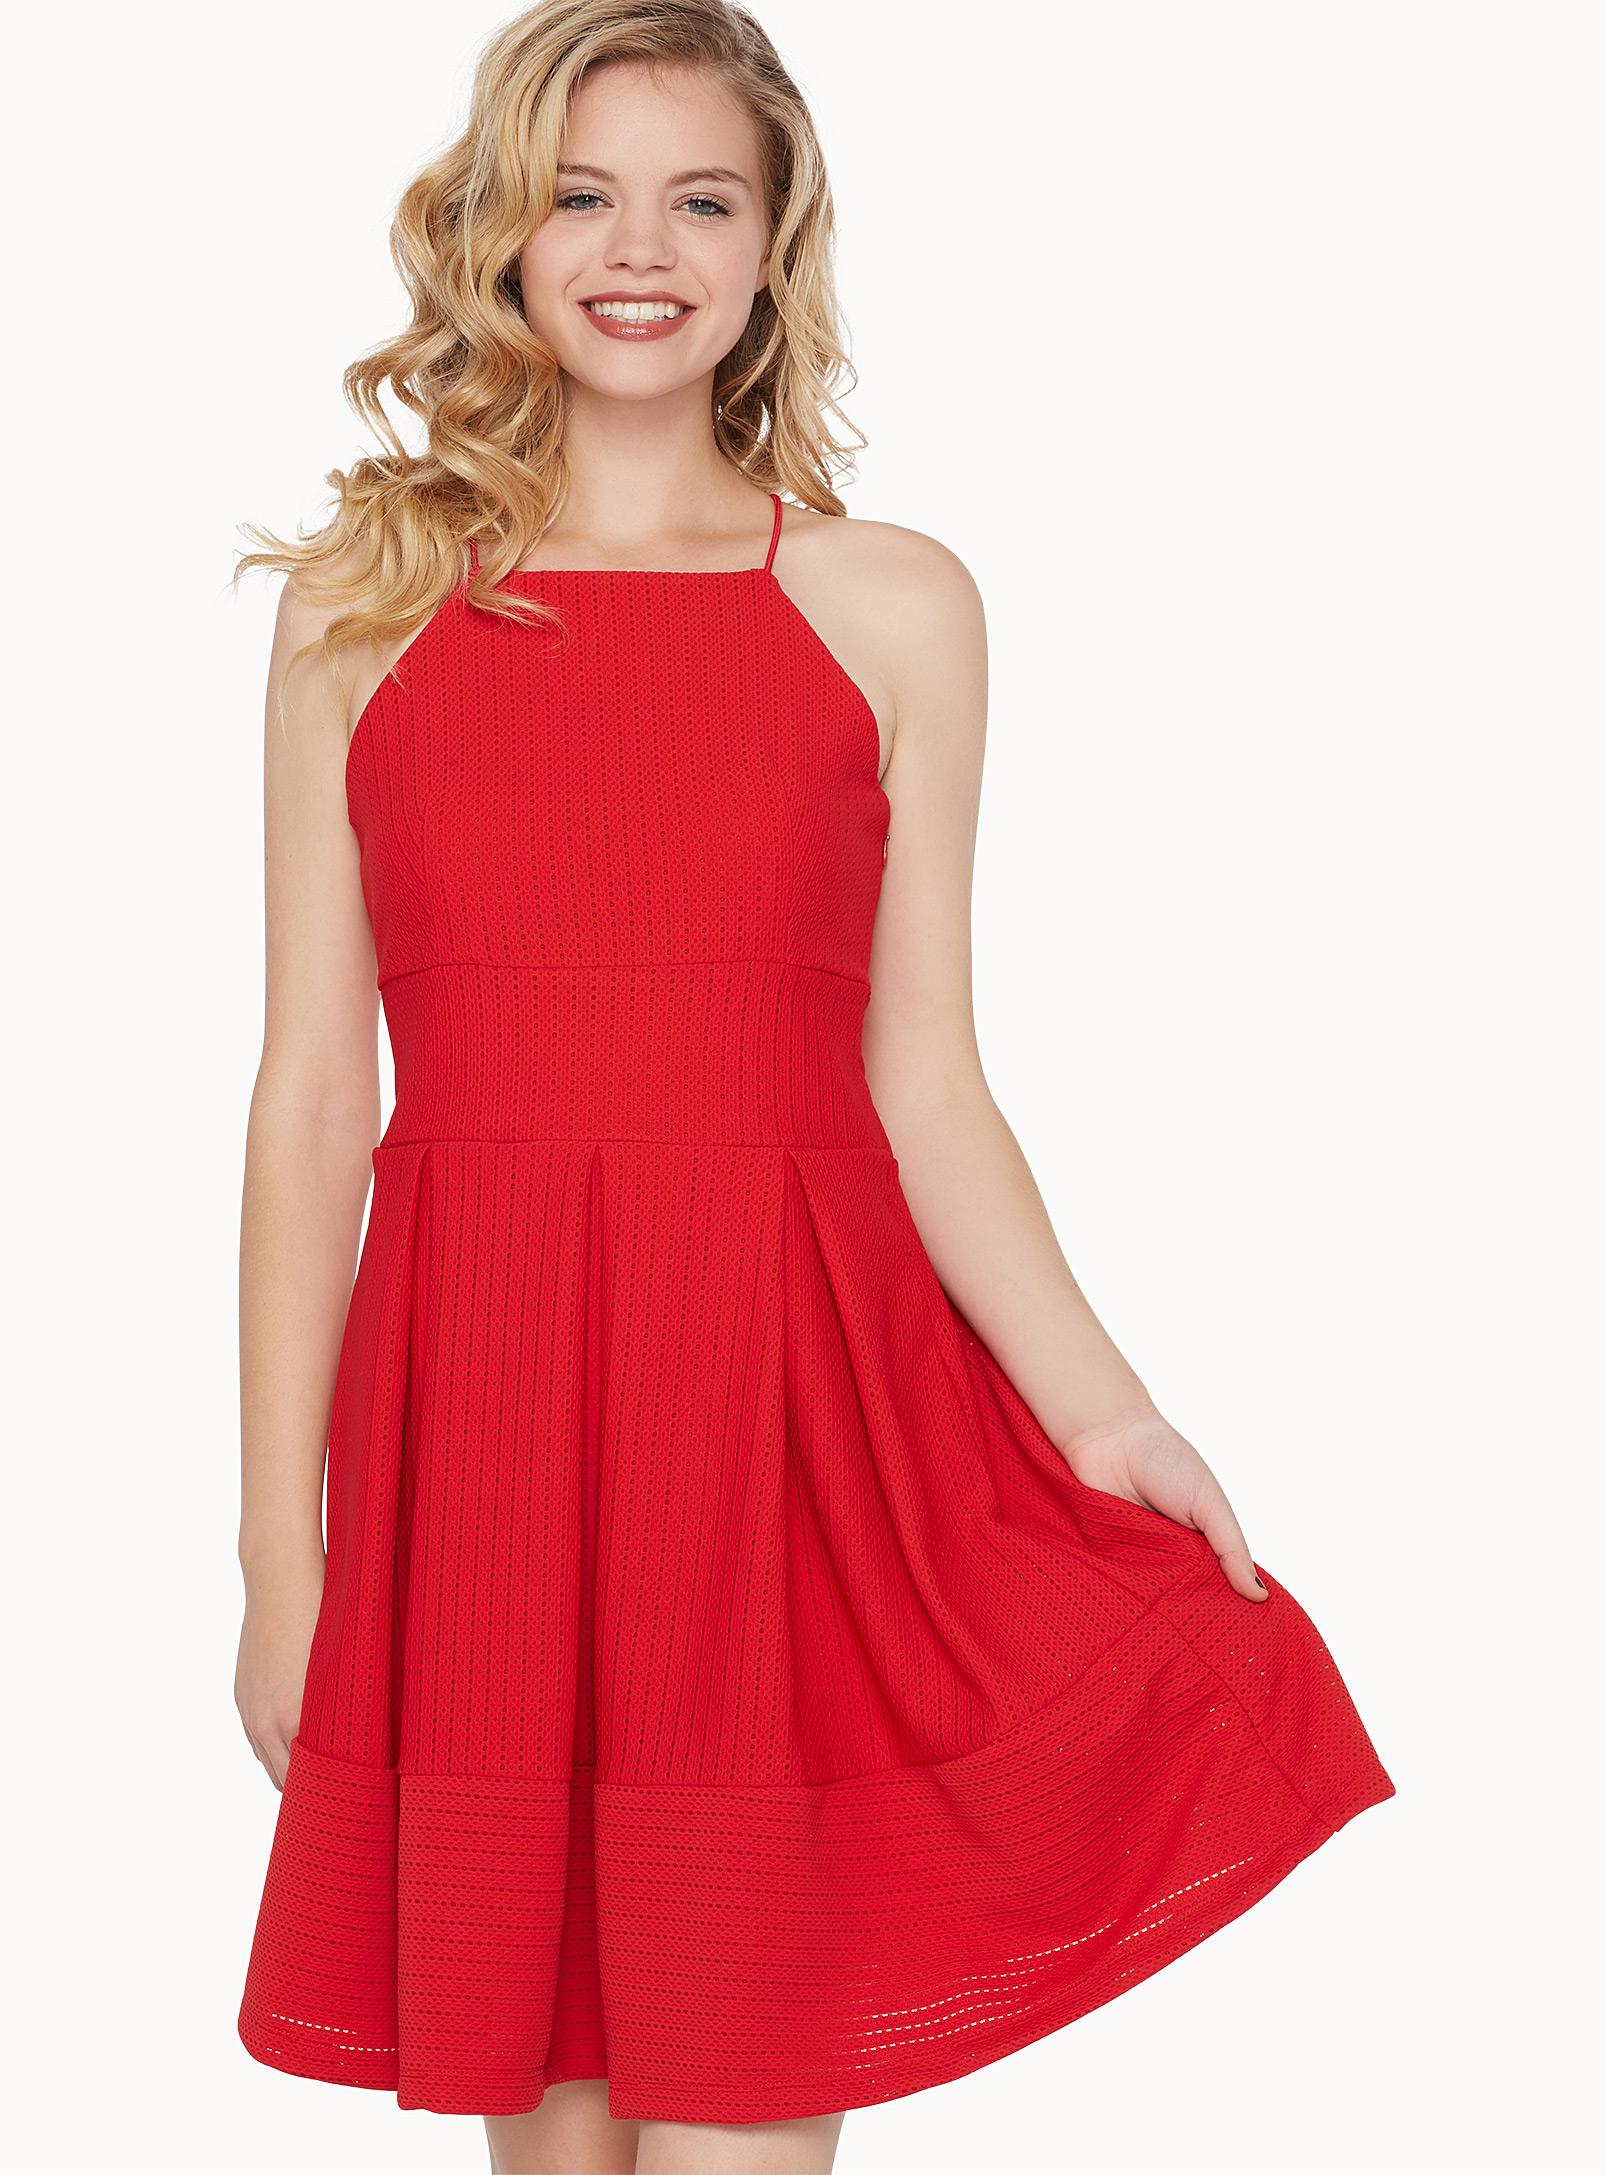 rouge, robe, simple